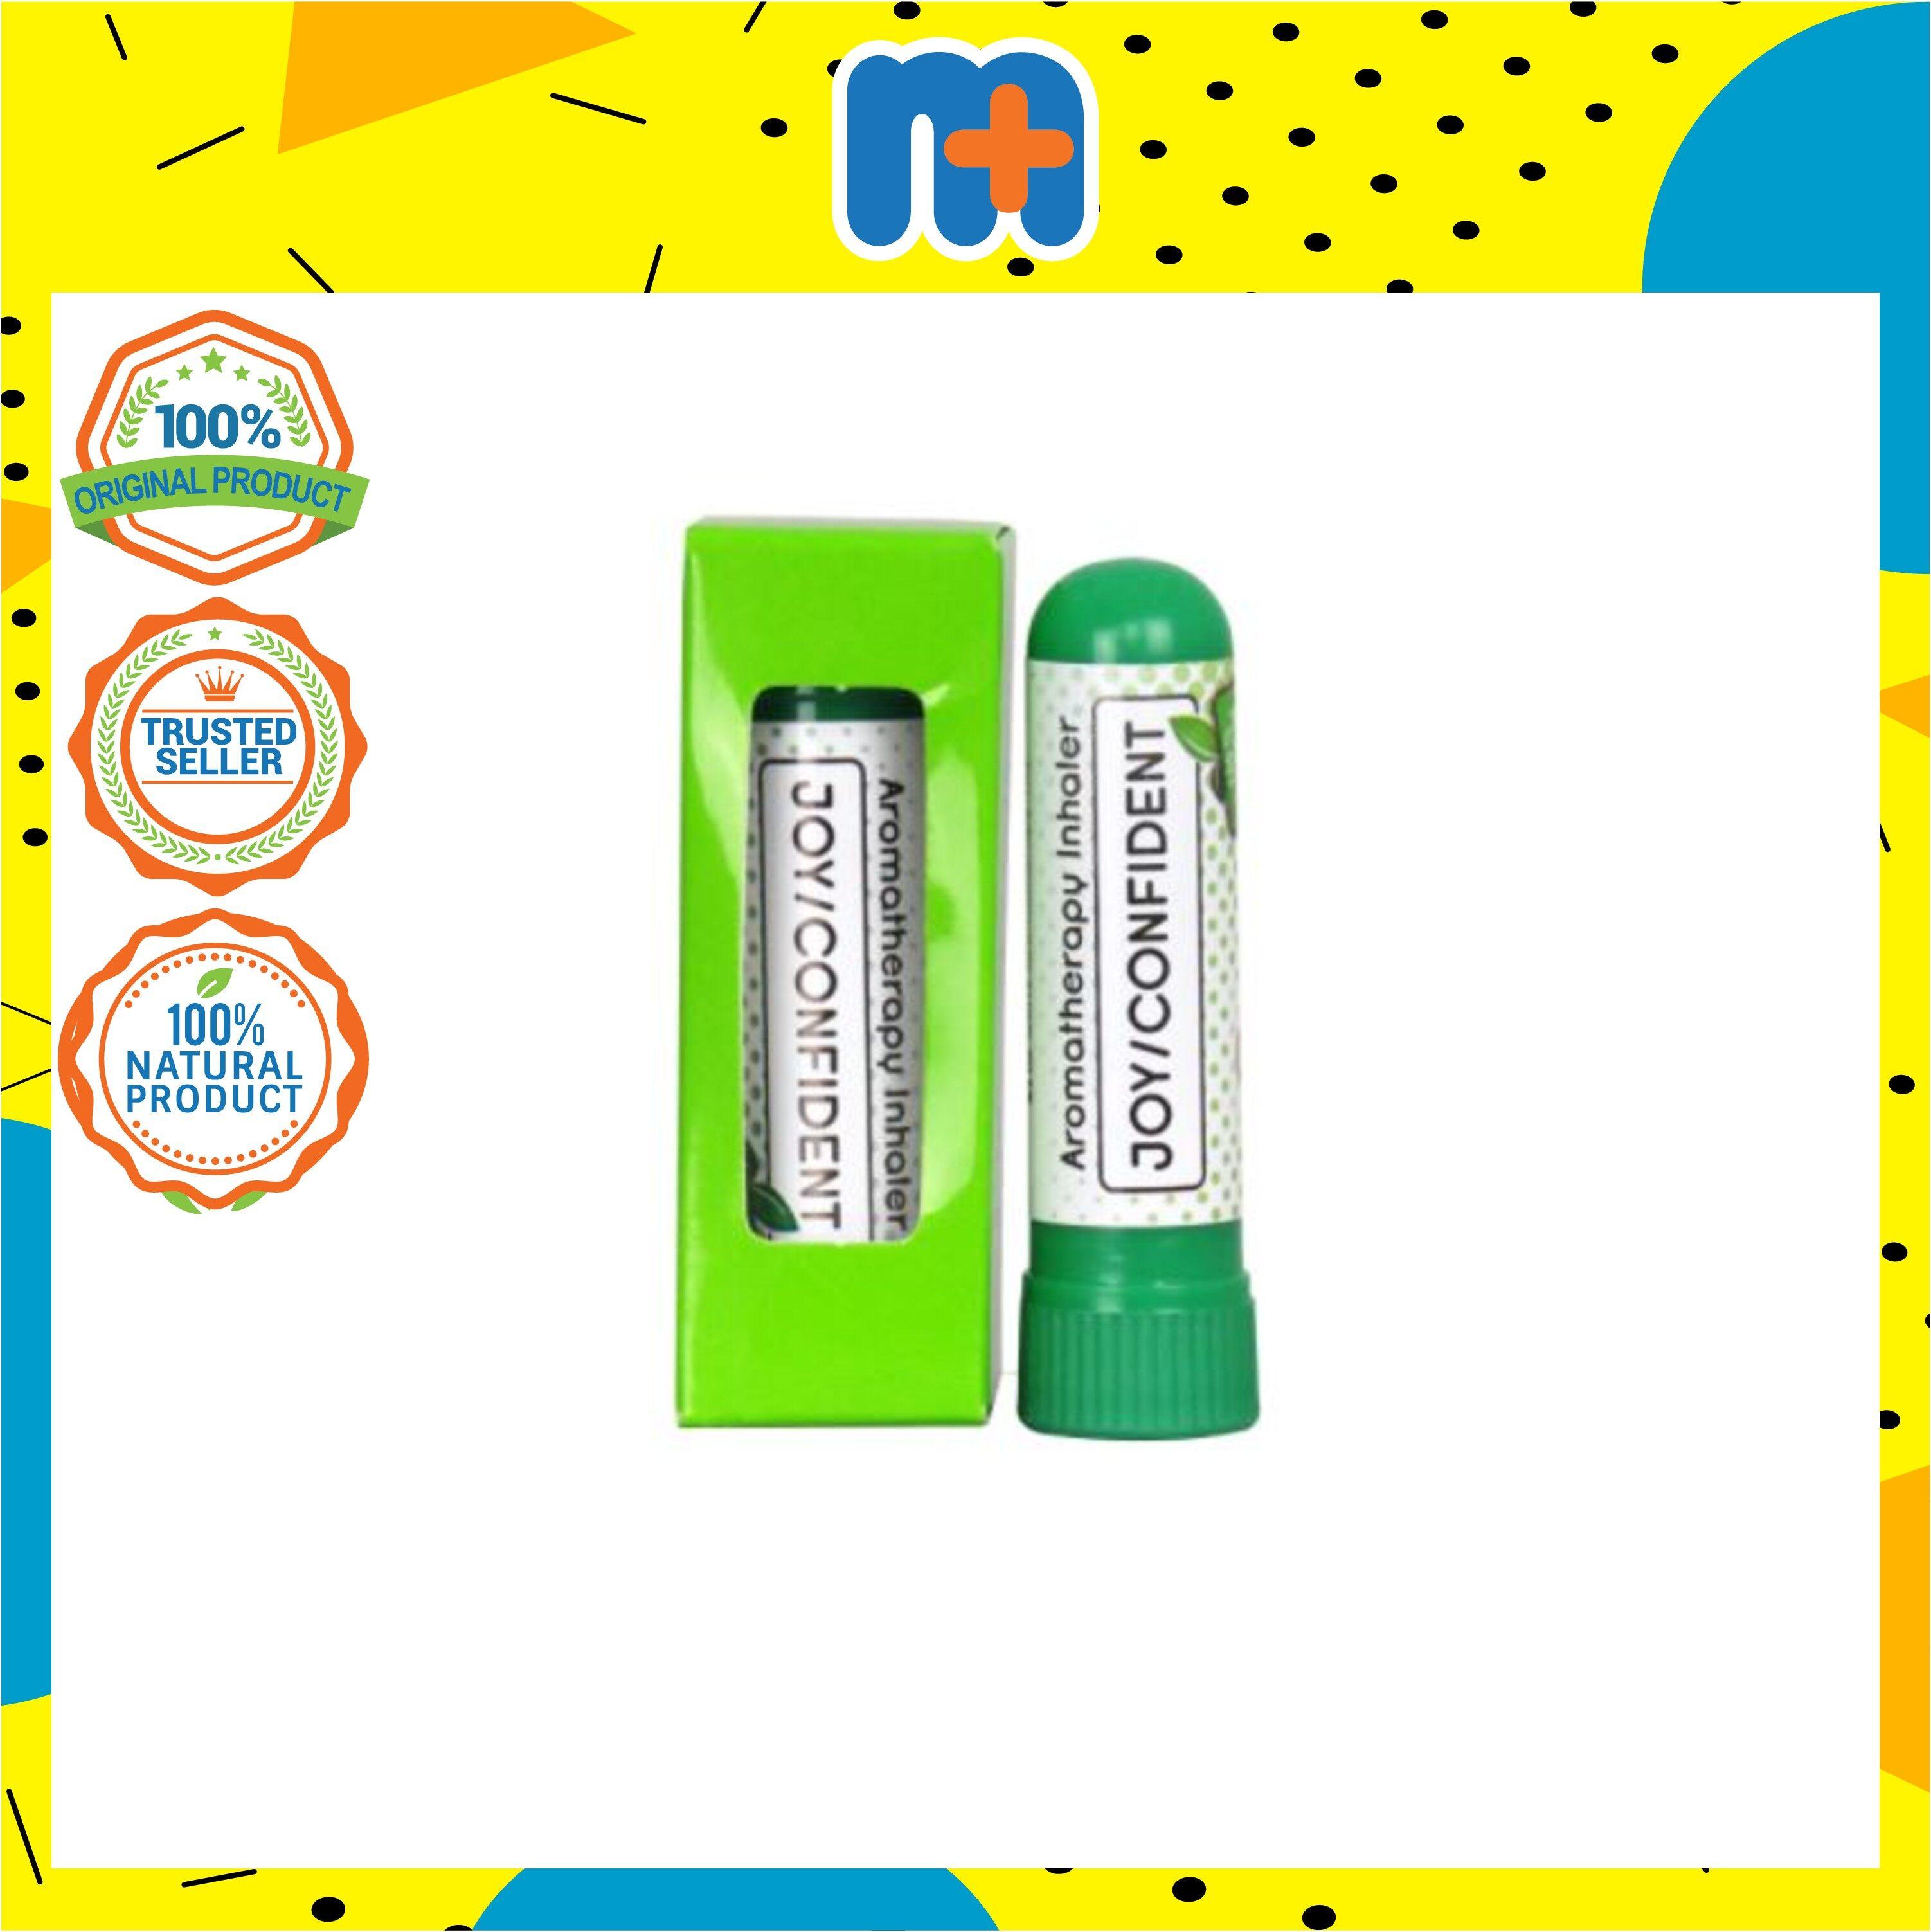 [MPLUS] GRITZ Aromatherapy Inhaler - Joy/Confident 2ml